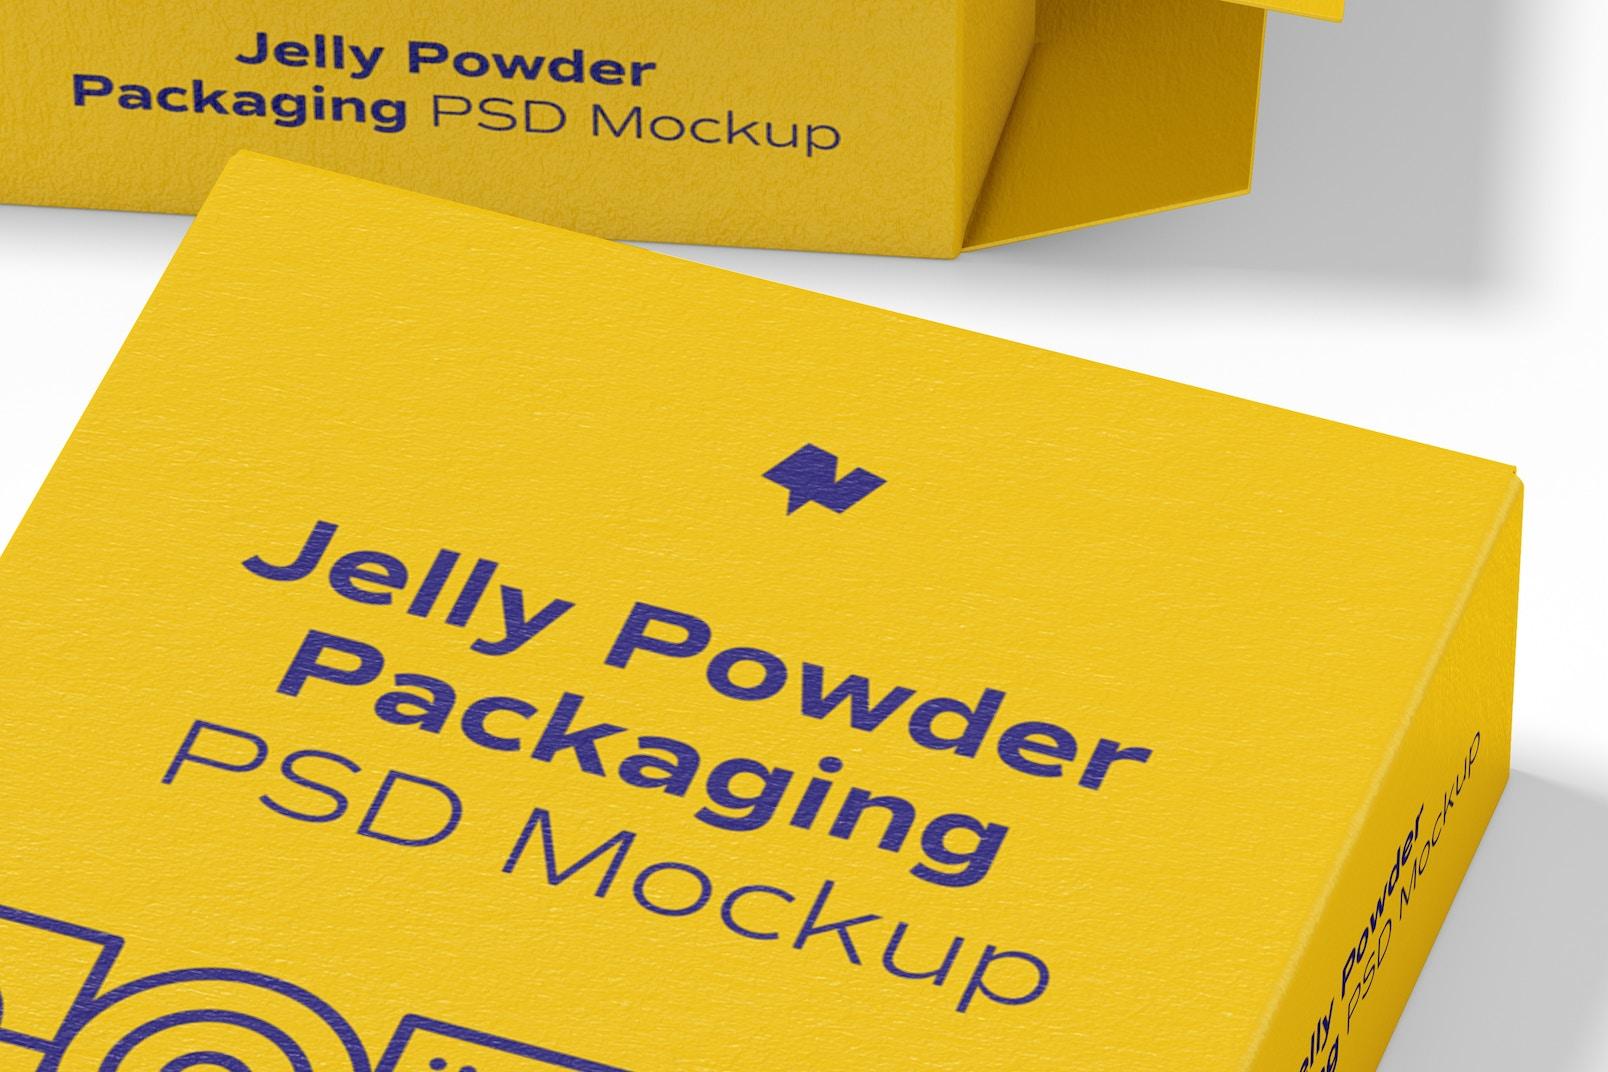 Jelly Powder Packaging Mockup, Close-Up